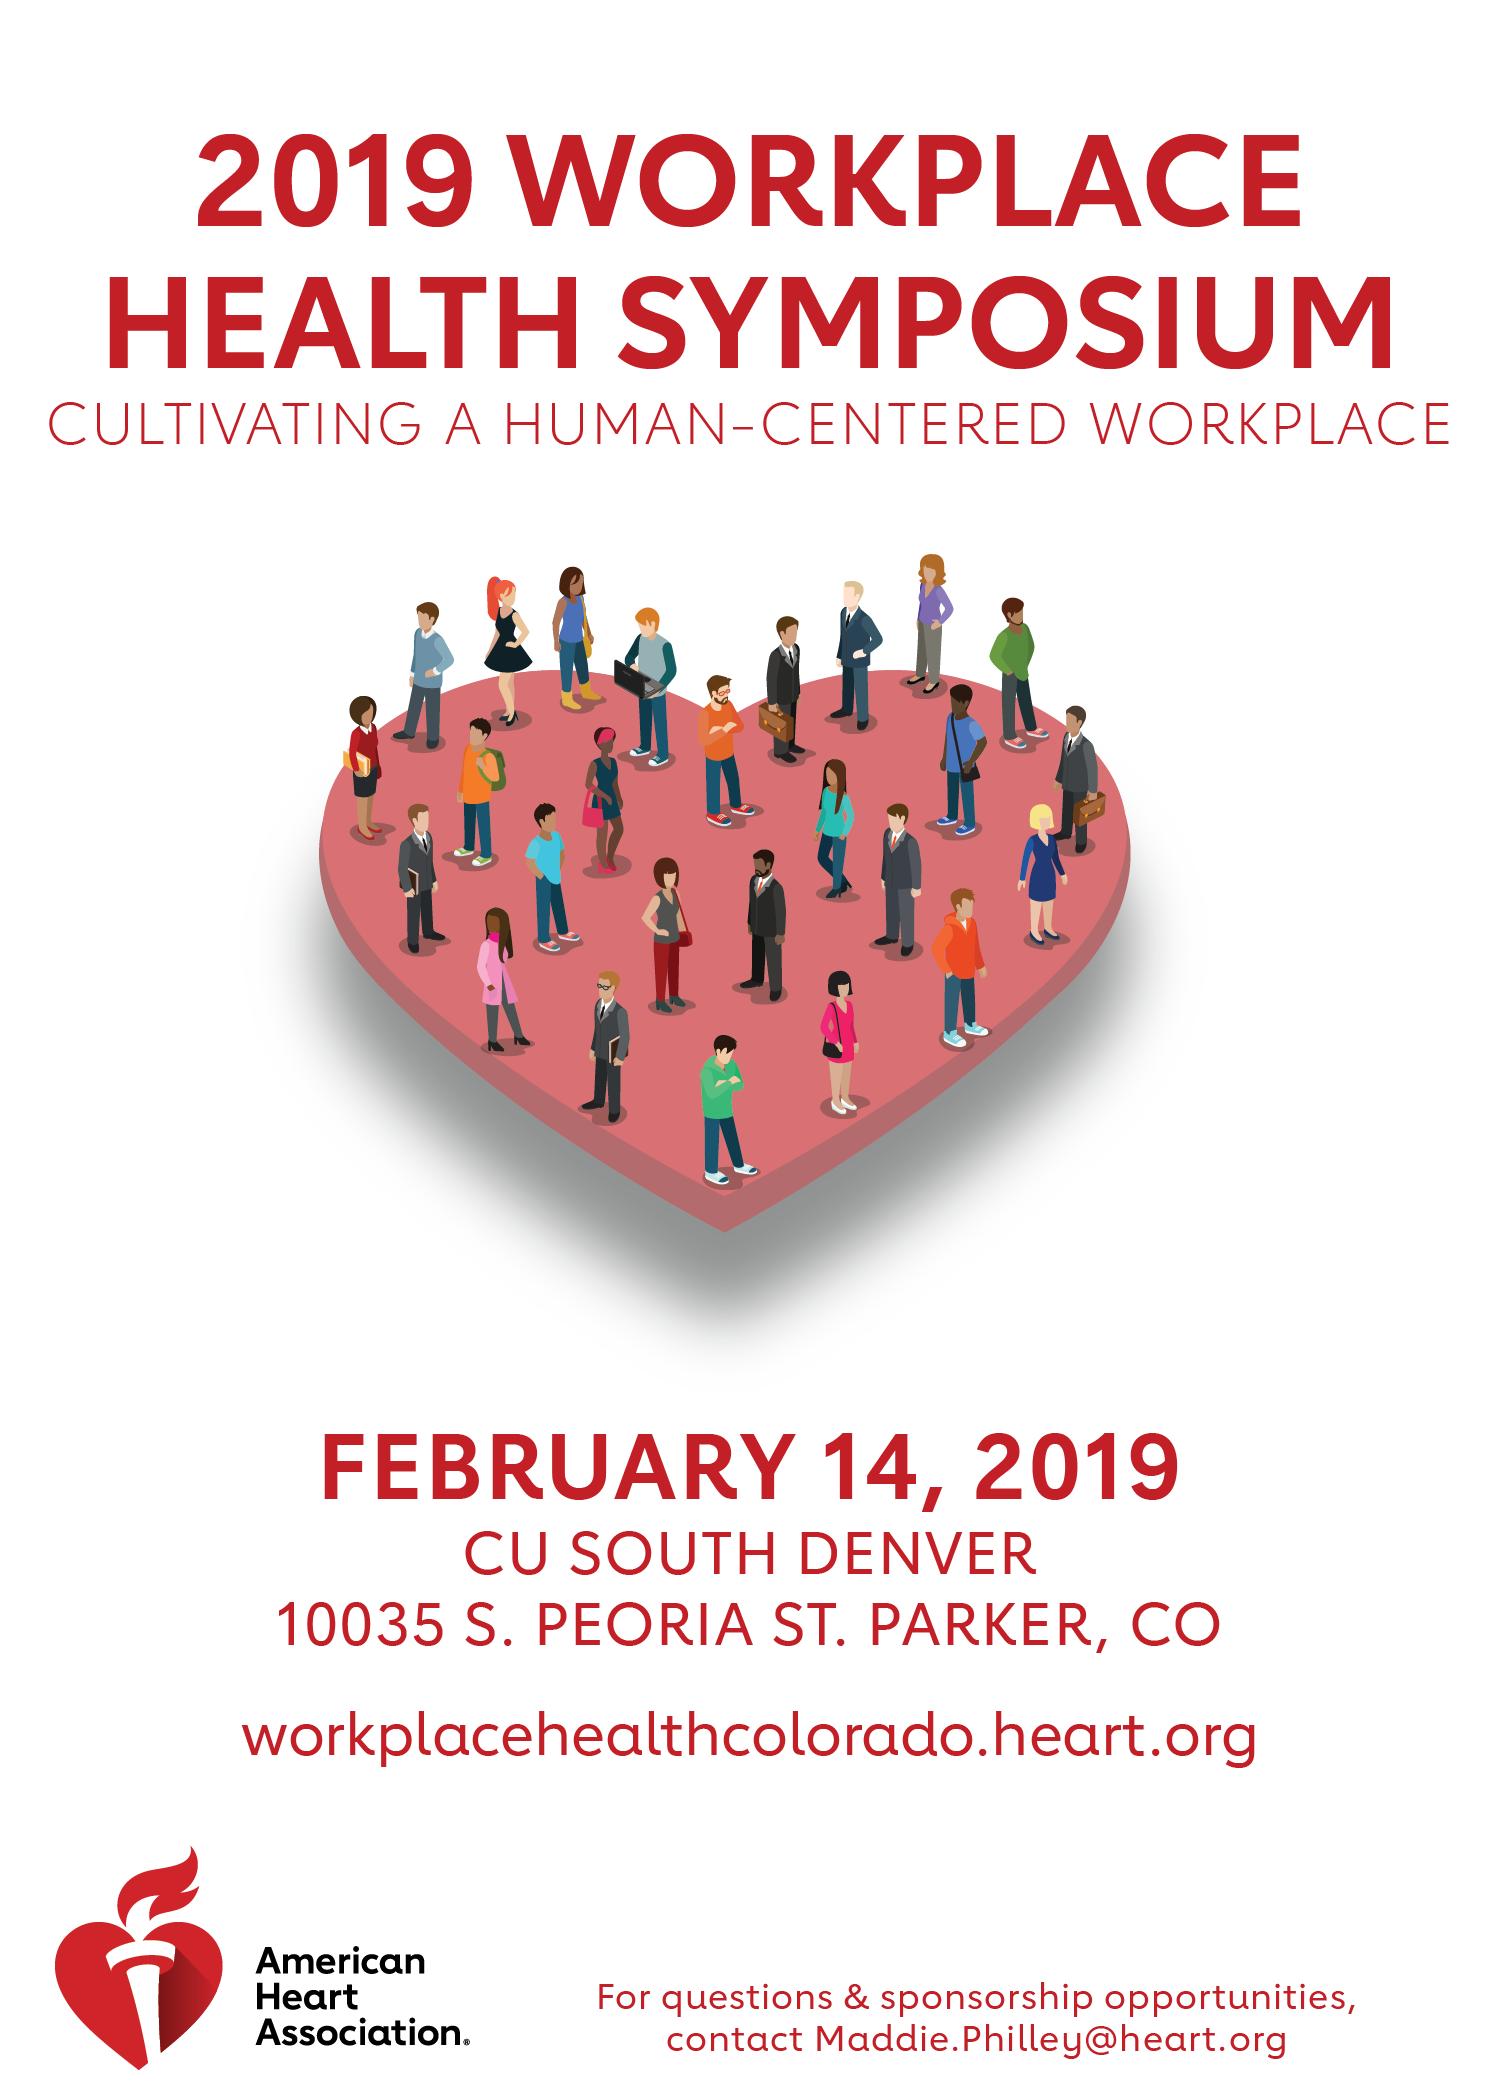 Workplace Health Symposium